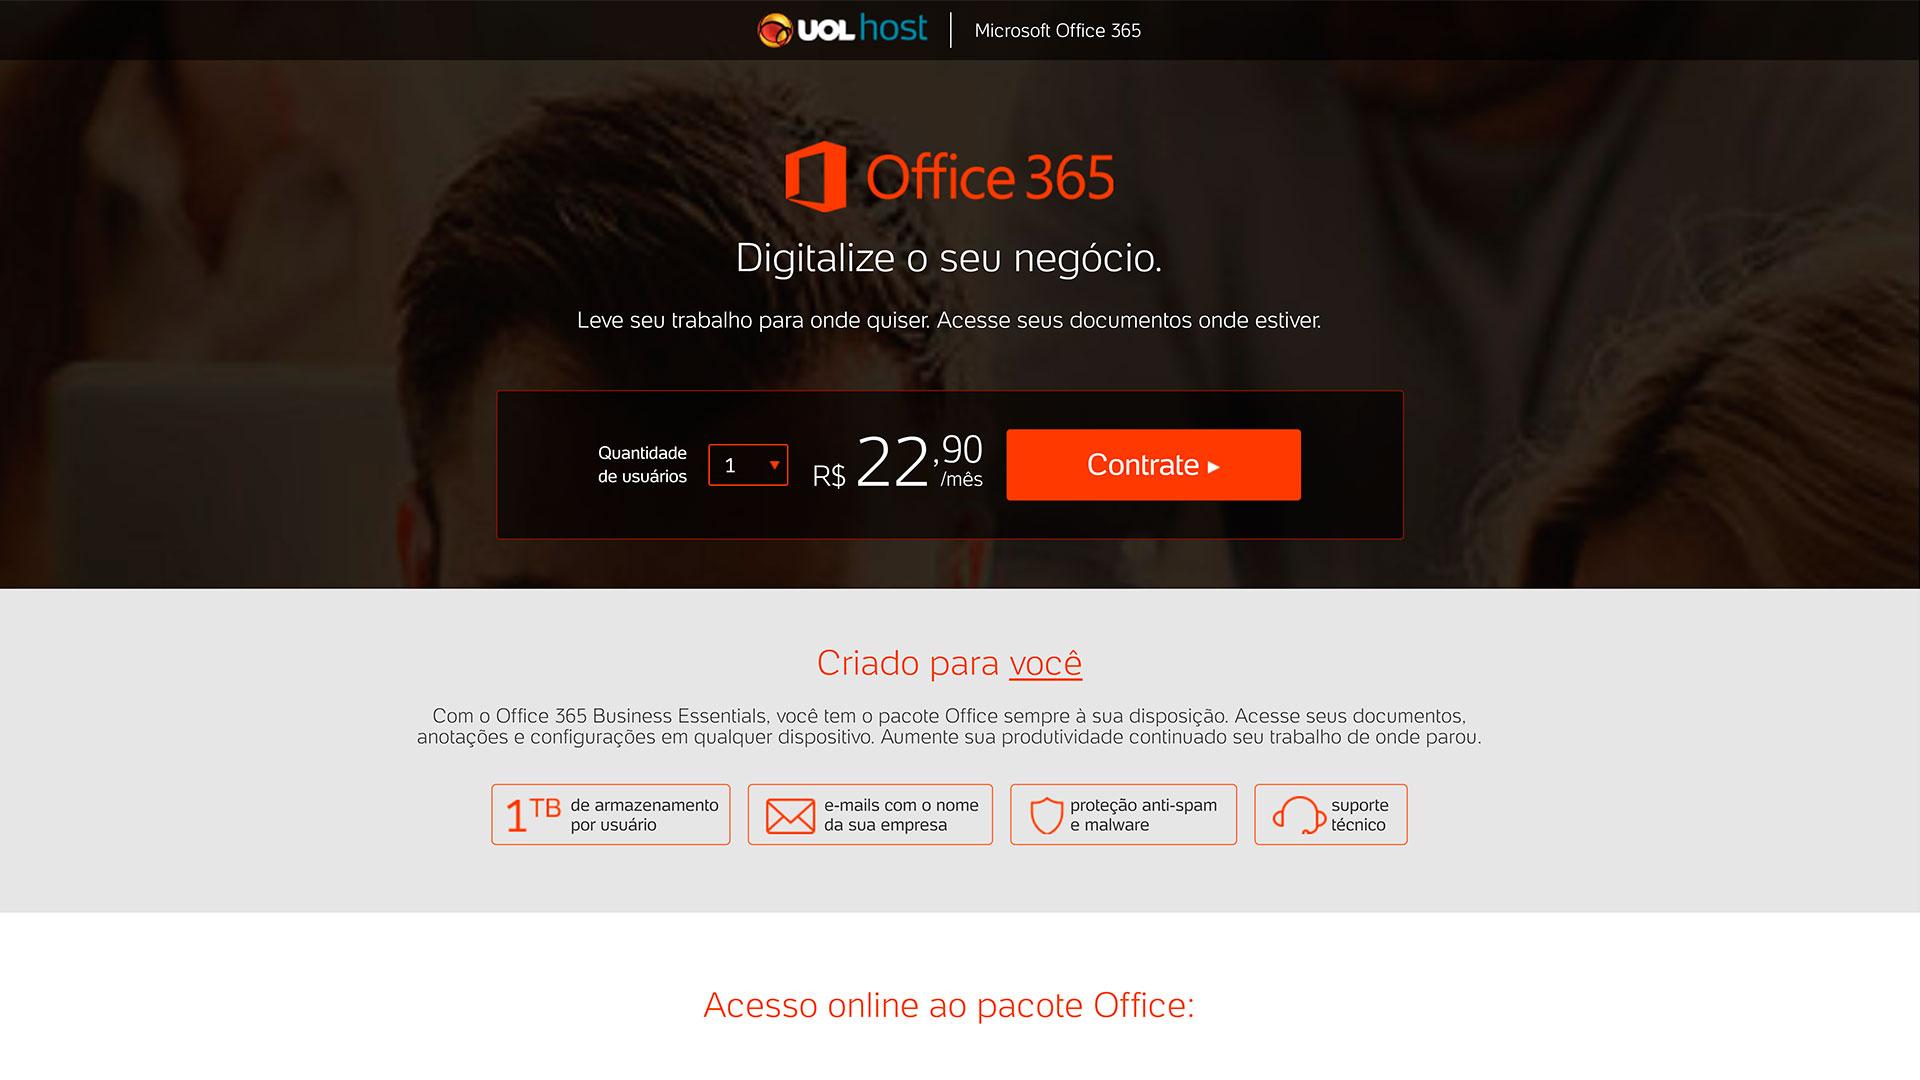 uol host microsoft office 365